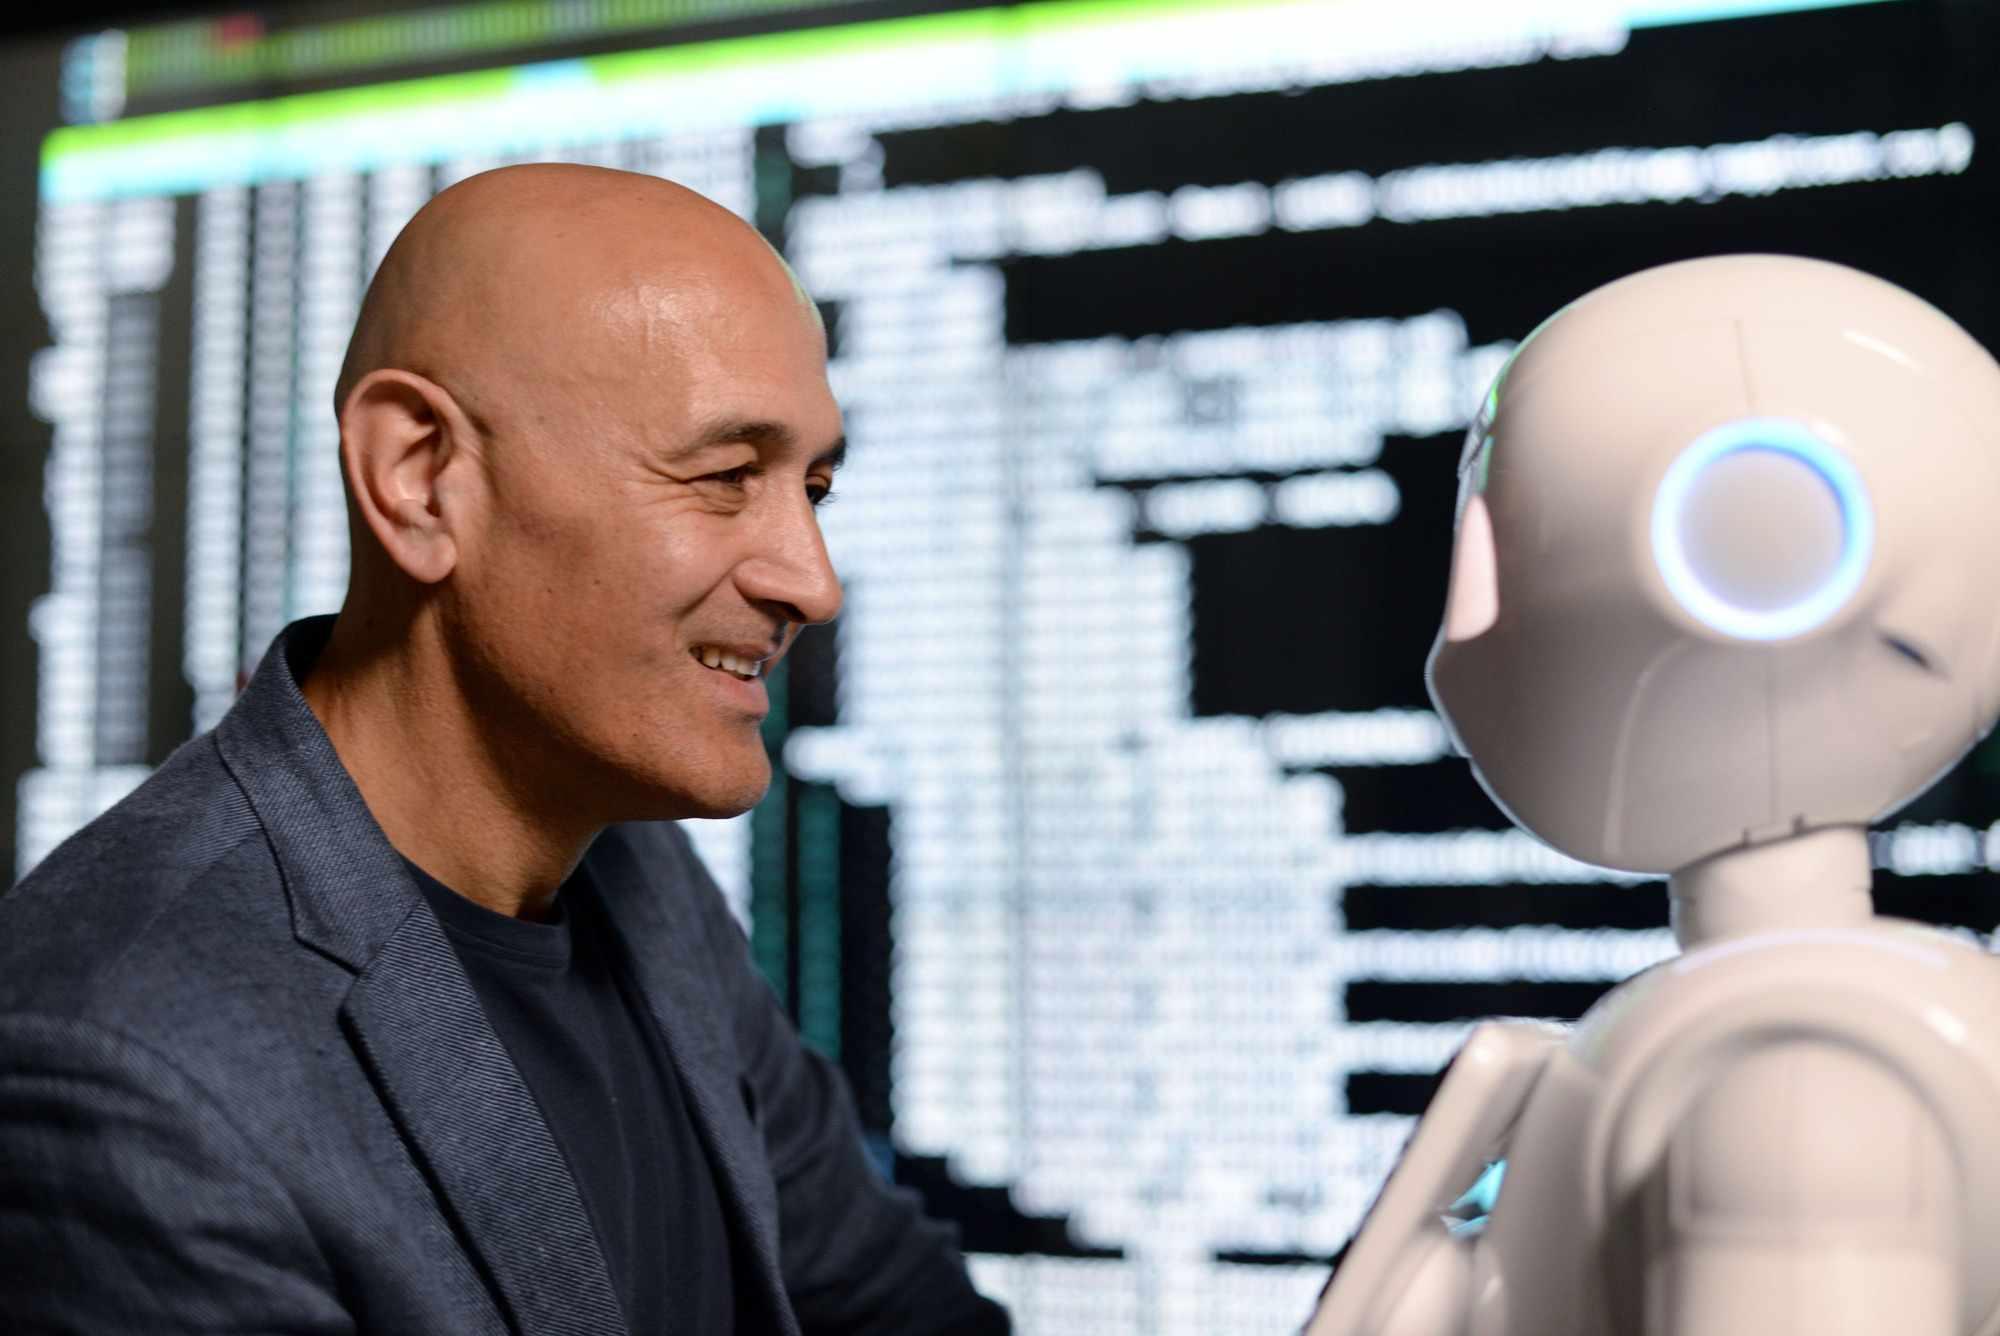 Professor Jim Al-Khalili befriends Alana - an advanced conversational AI © BBC/Wingspan Productions/Jodie Adams